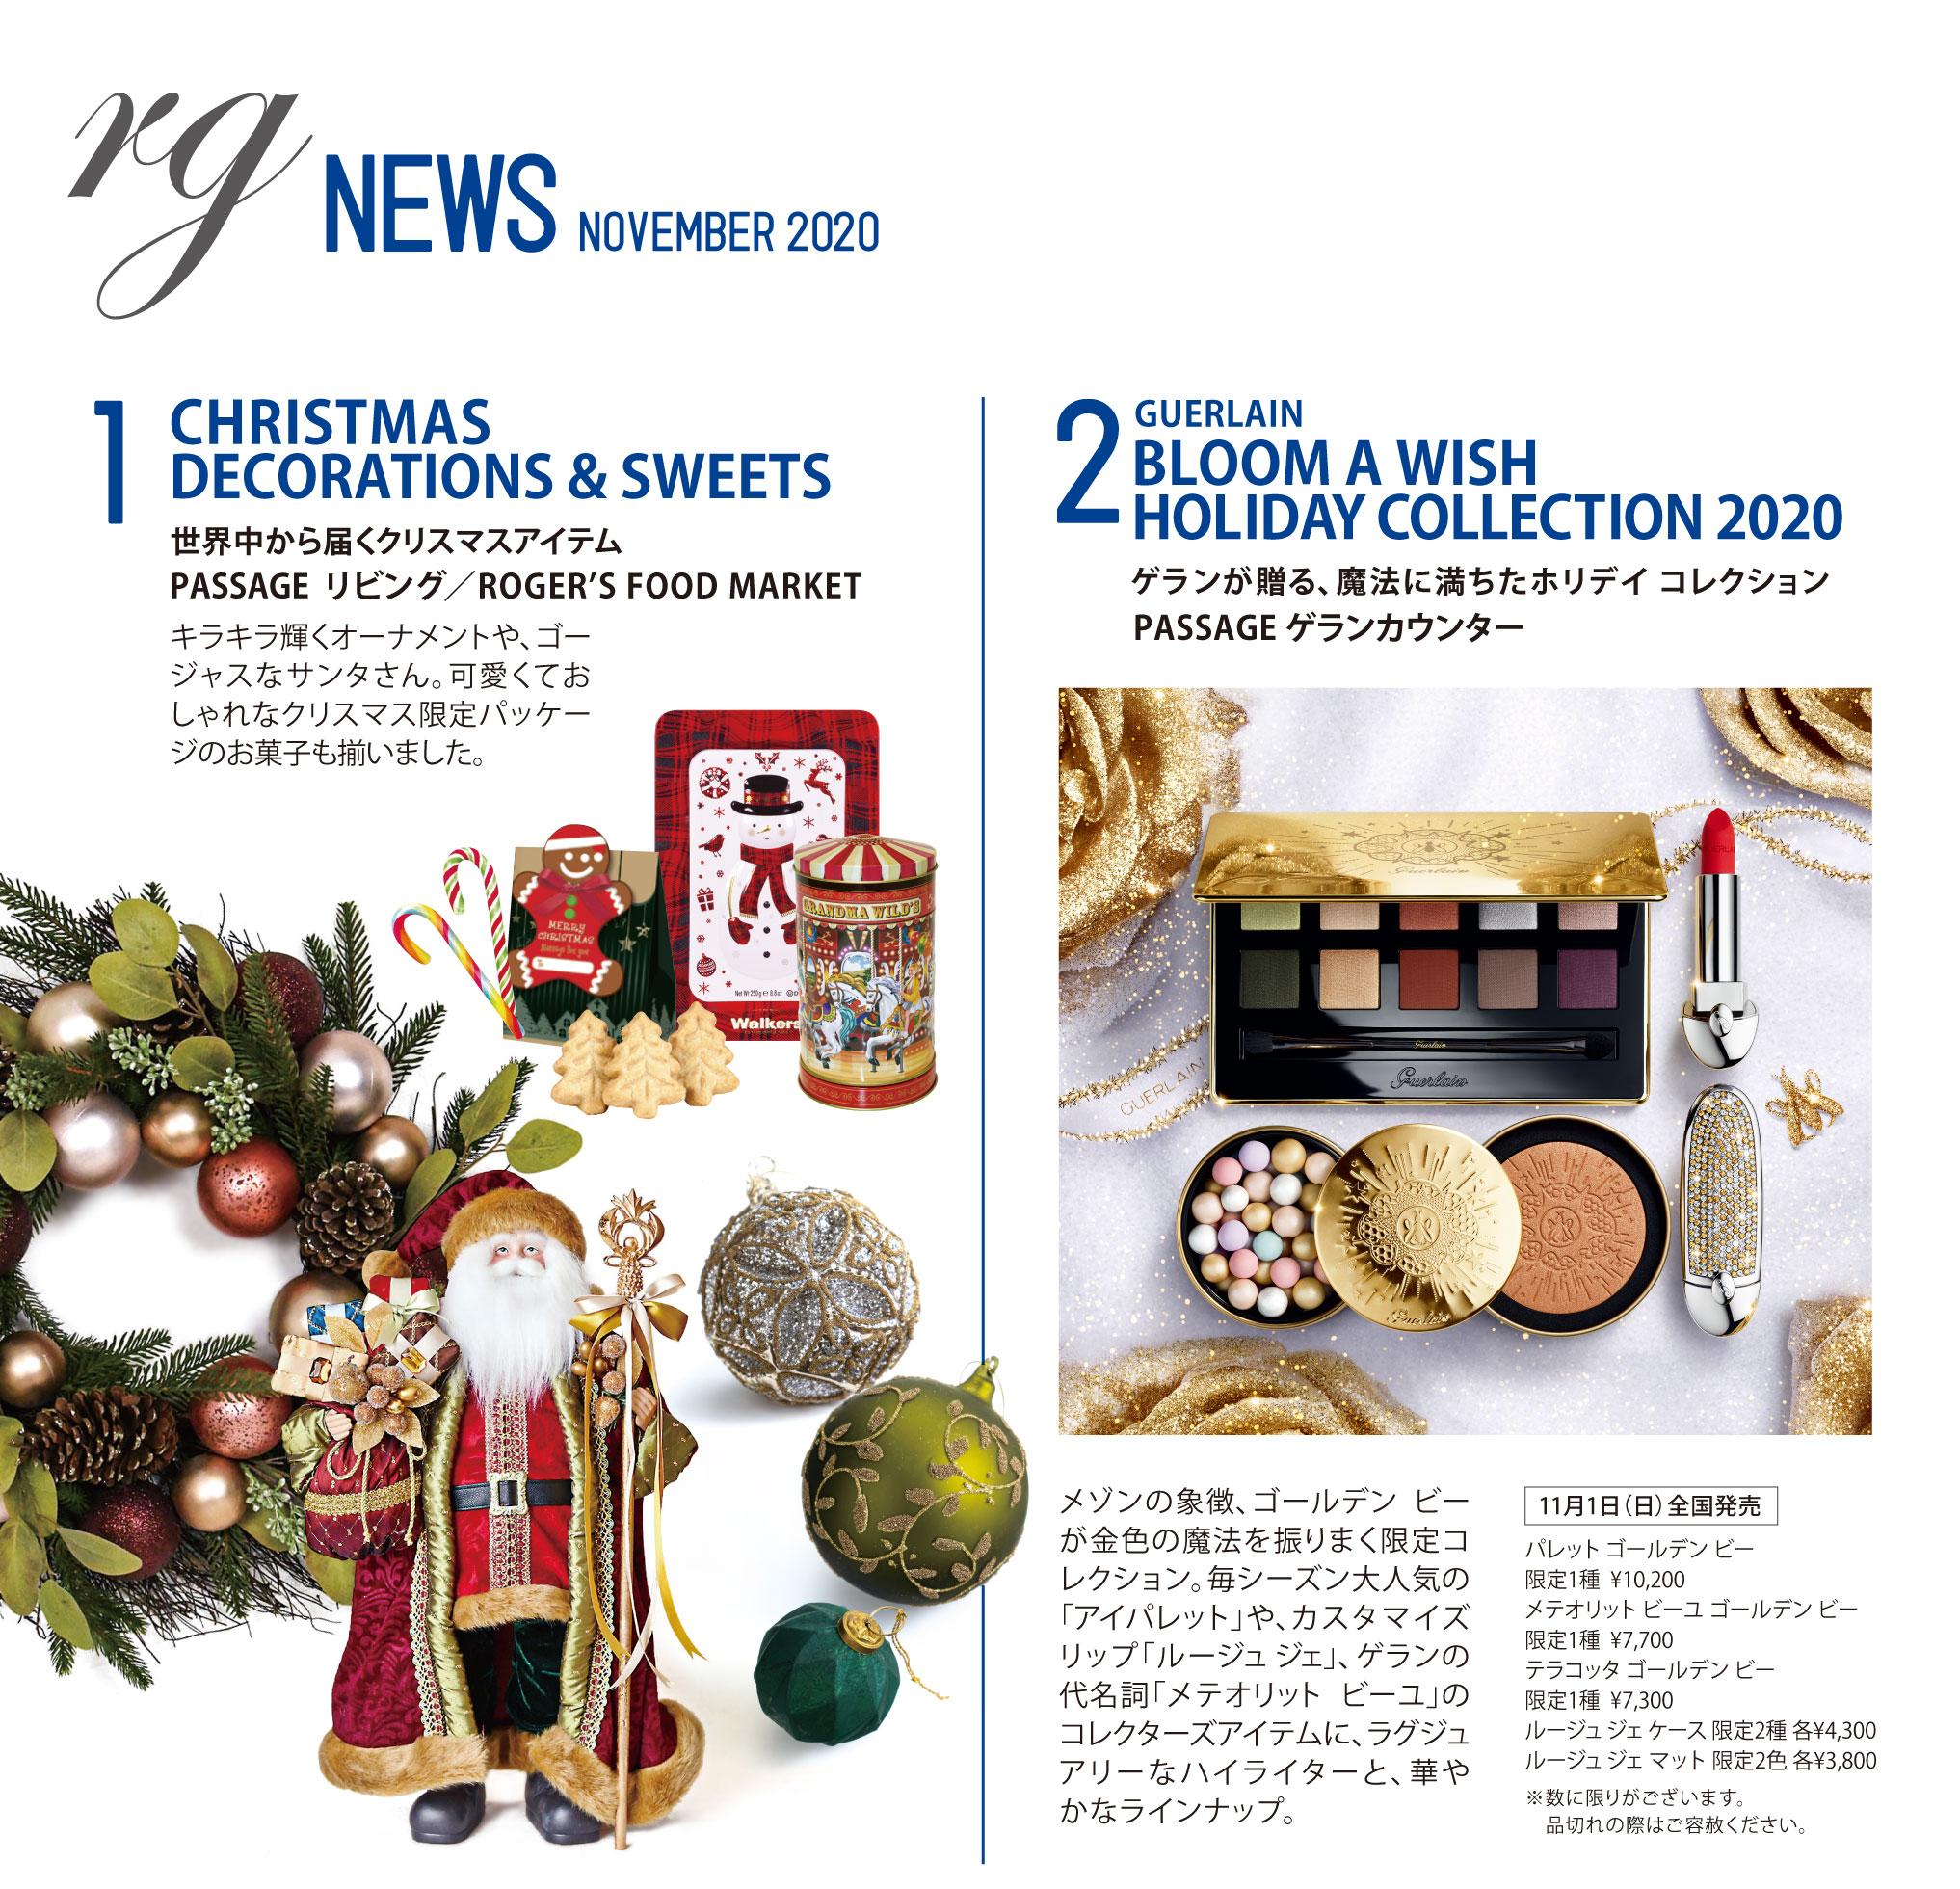 rg NEWS NOV_2020_1 世界から届くクリスマスデコレーション<br /> ゲランが贈るホリディコレクション